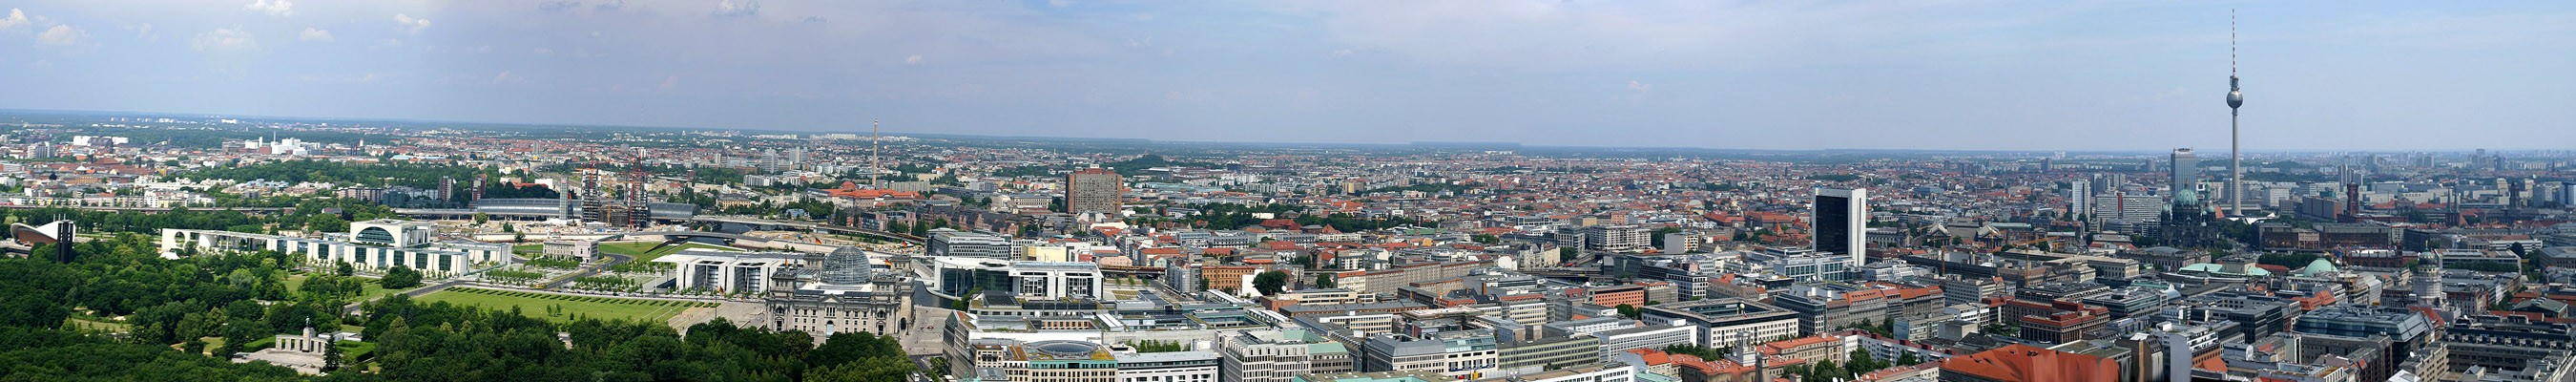 Berlin_Panorama.jpg